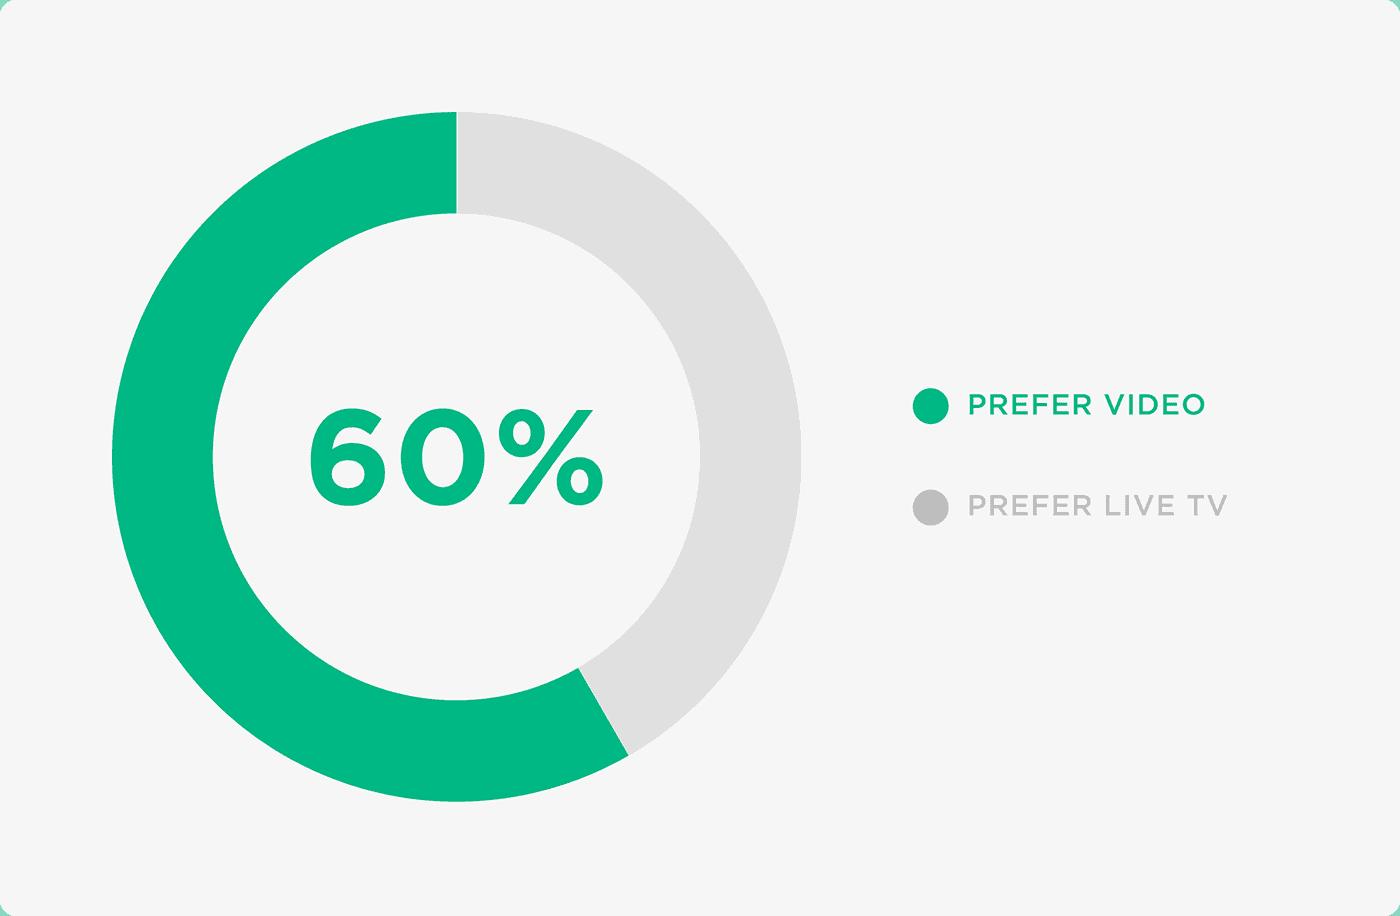 60% of Americans prefer video over live TV